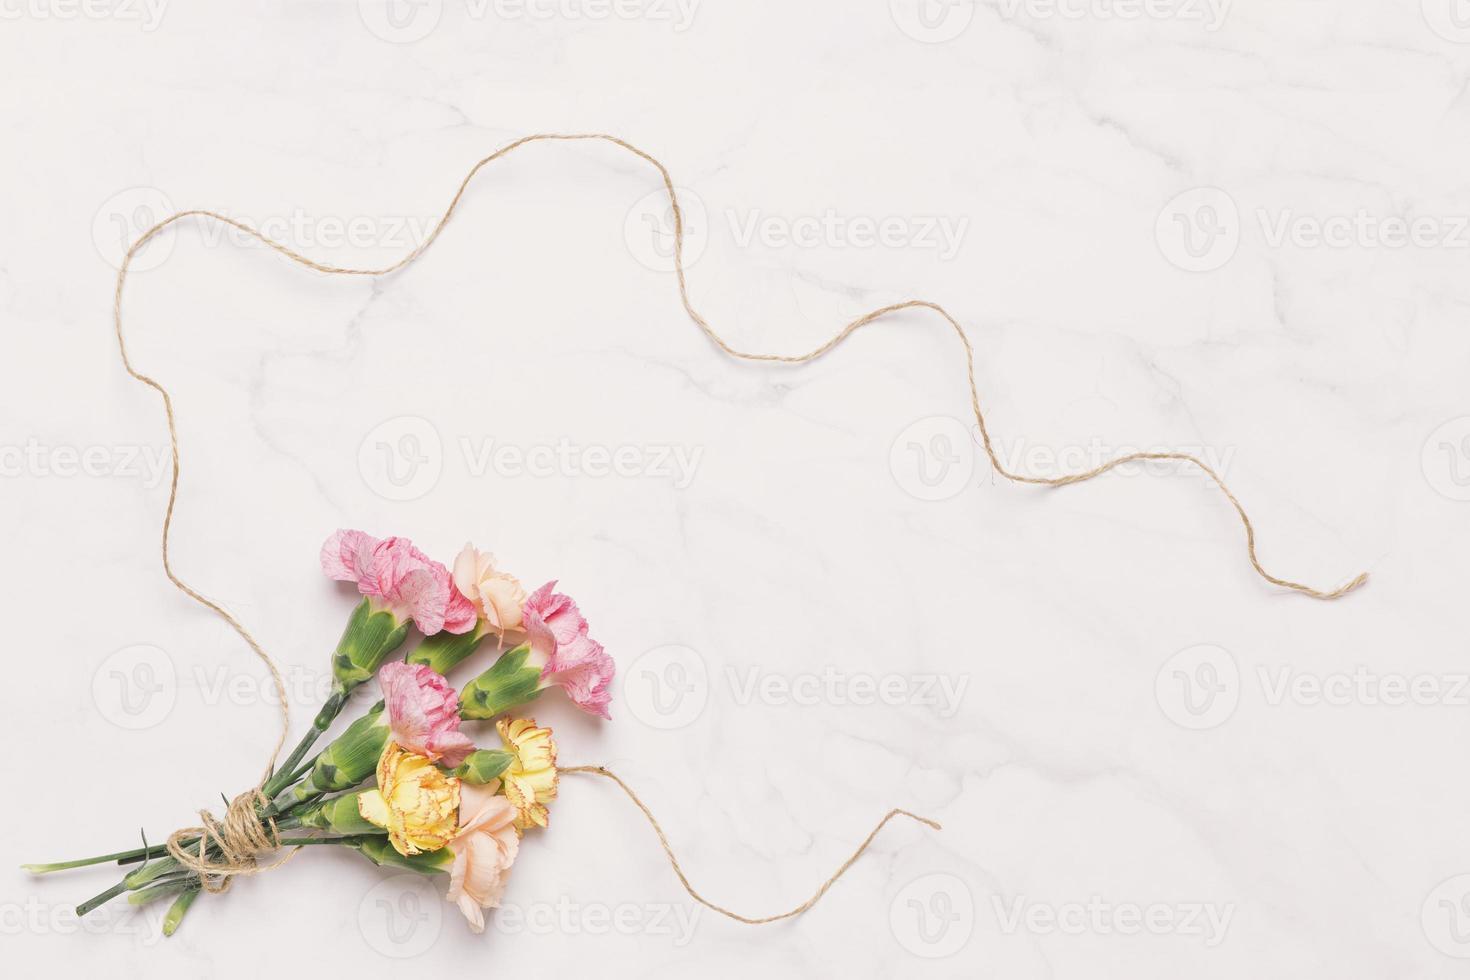 blommor på ljus bakgrund foto